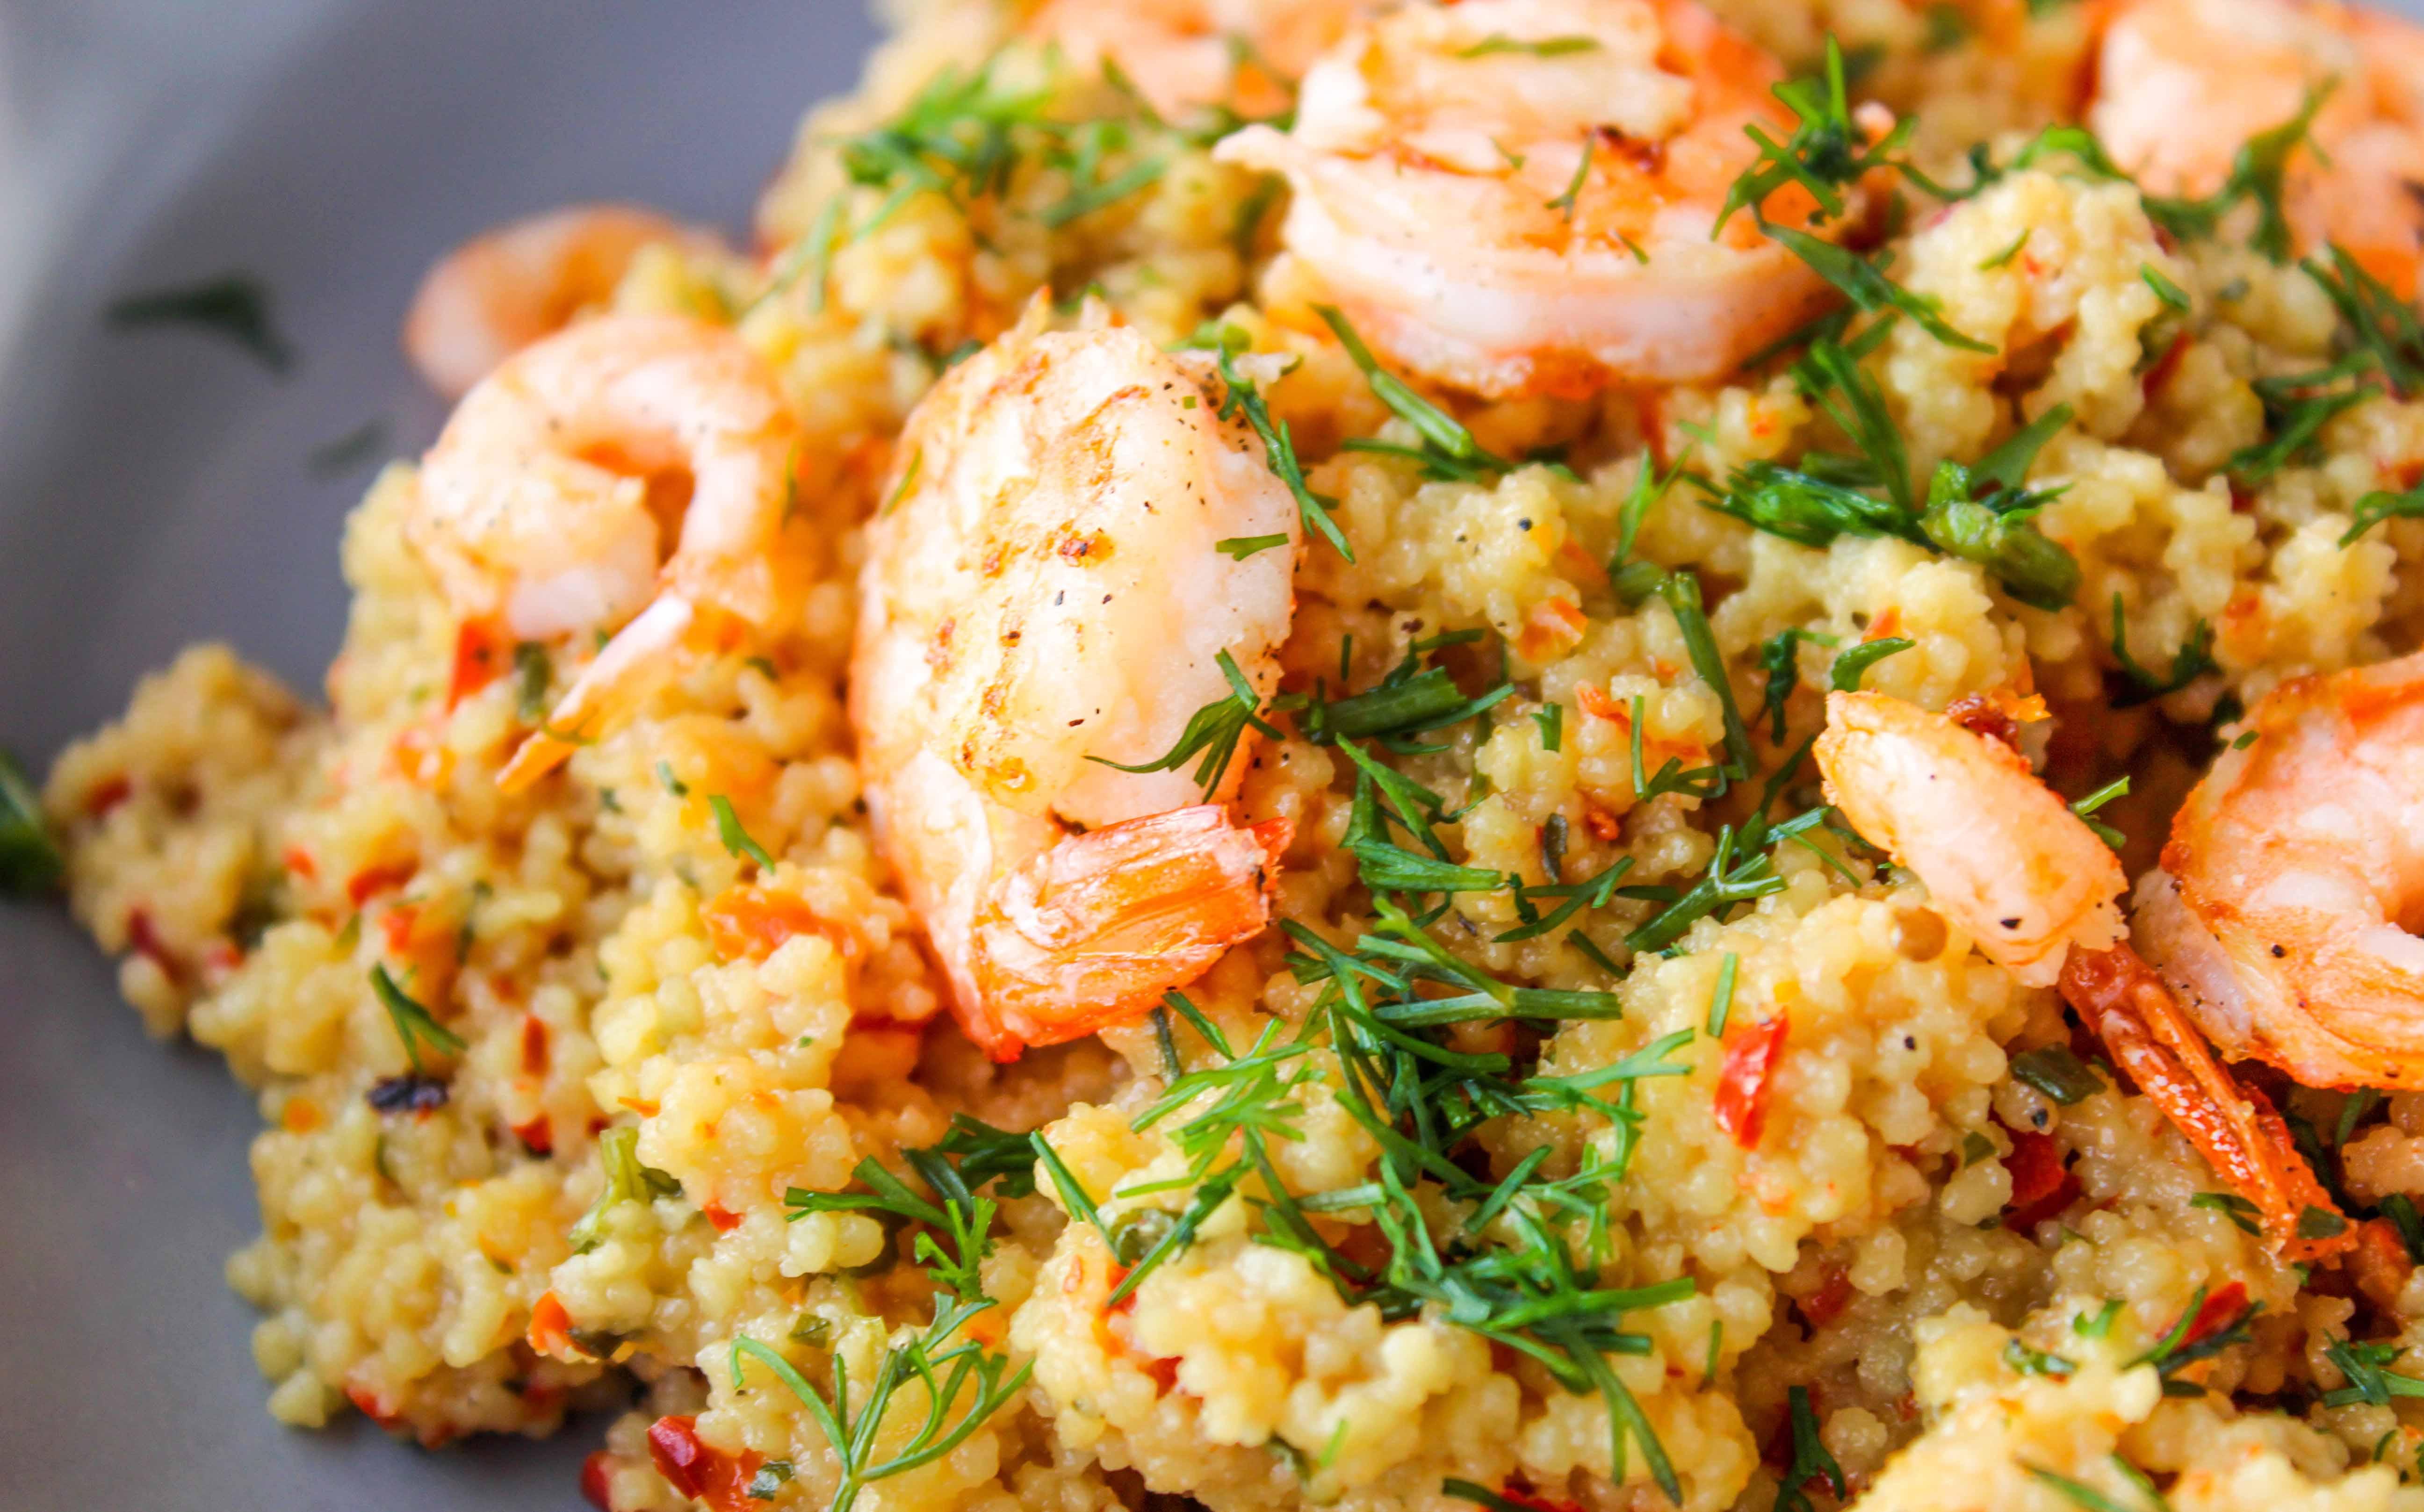 cous-cous-verdure-gamberetti-ristorante-filippino-lipari.